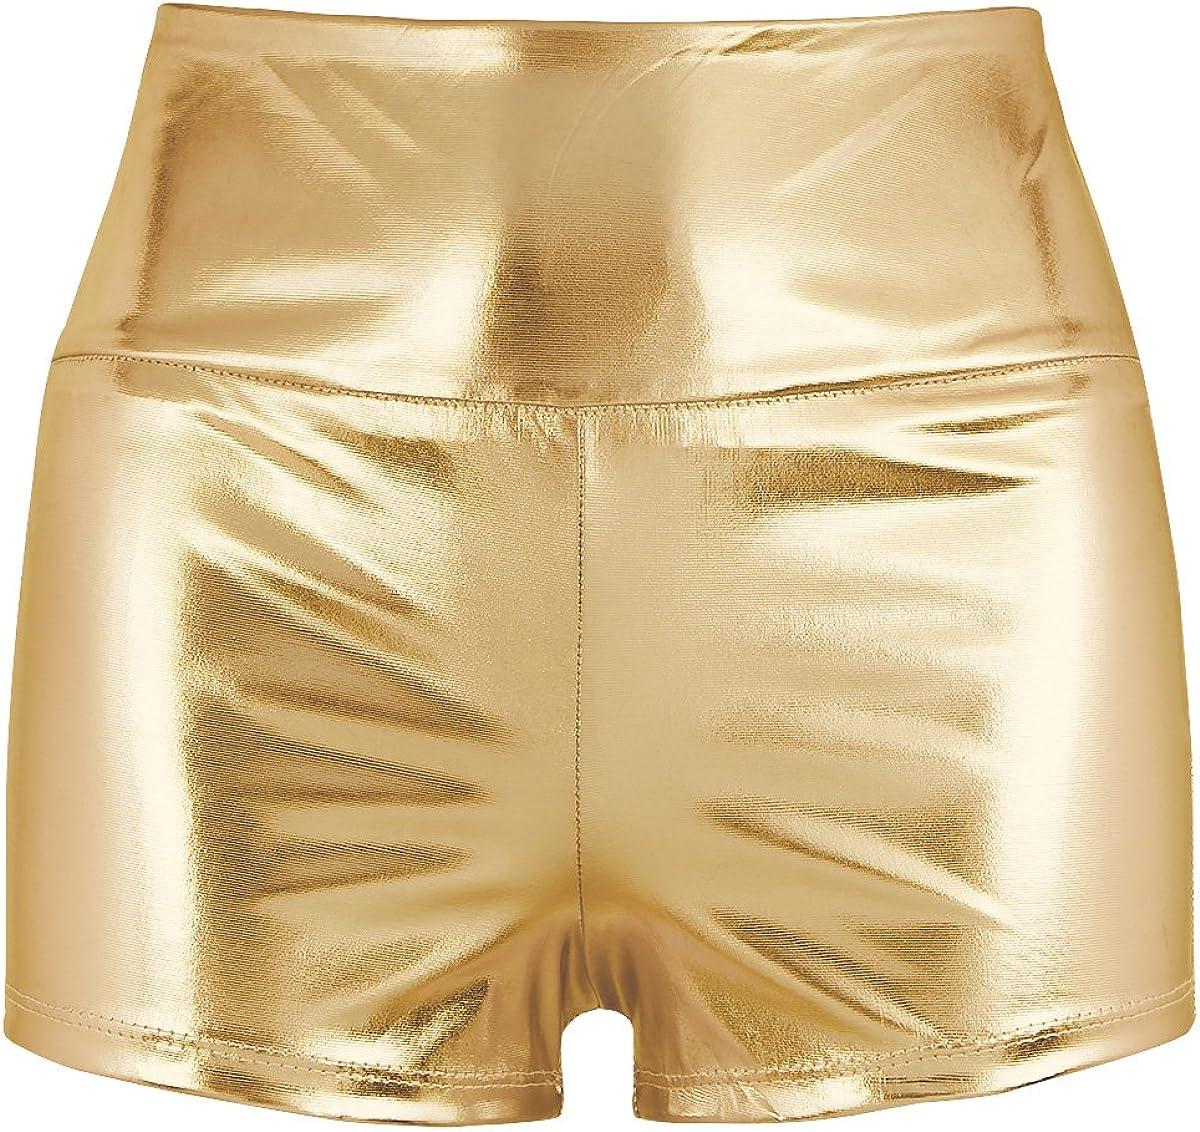 MSemis Shorts Wetlook Pantalones Cortos Push Up para Mujer Mini Pantalones de Cuero Hot Shorts Pants Color Metálico Traje Fiesta Pole Clubwear Dance